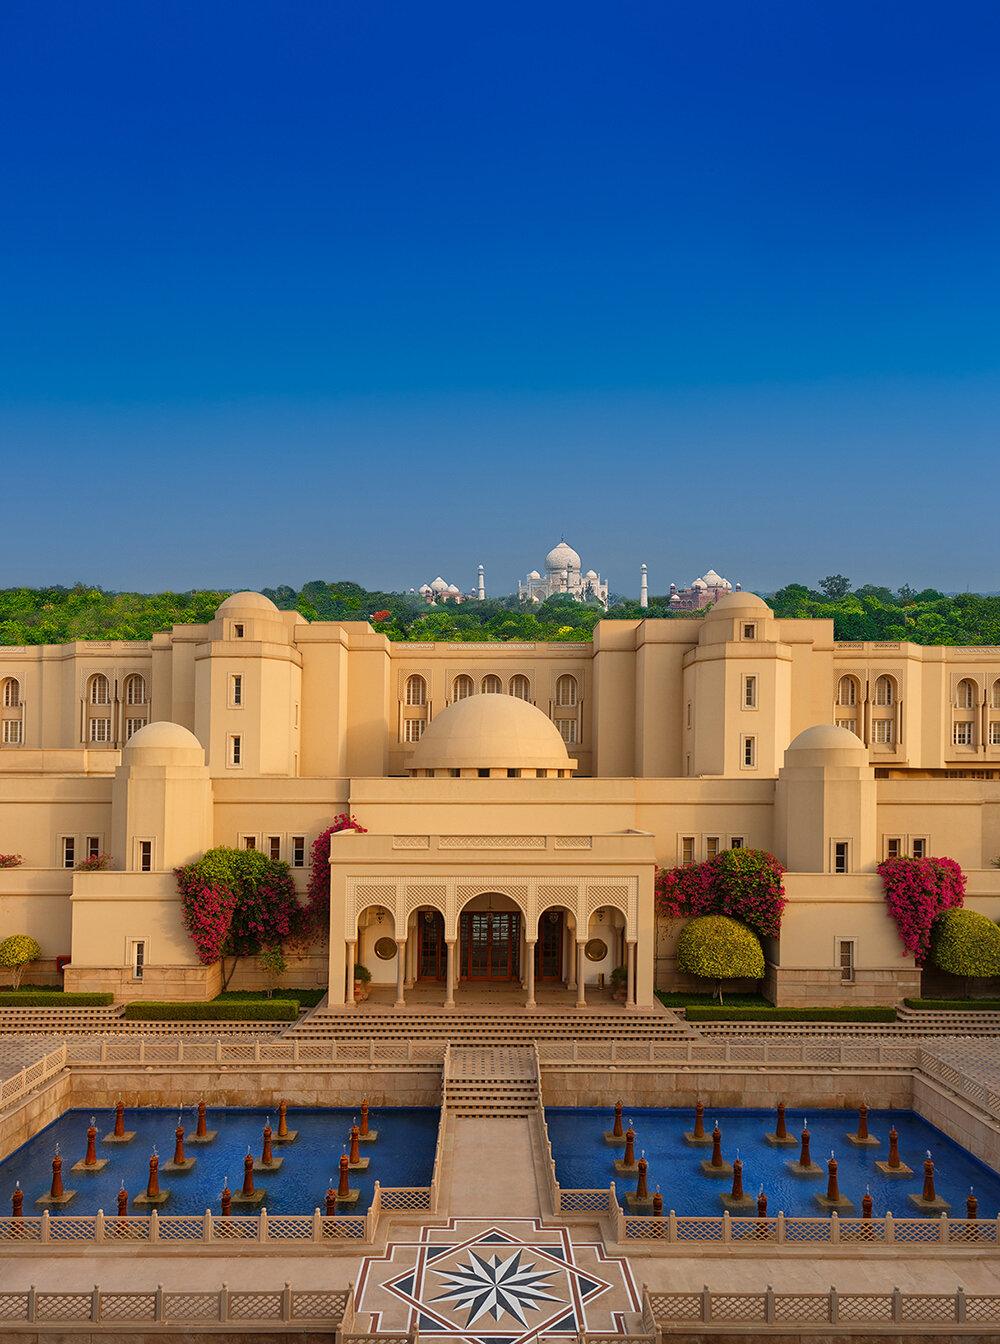 Oberoi Amarvillas, Agra